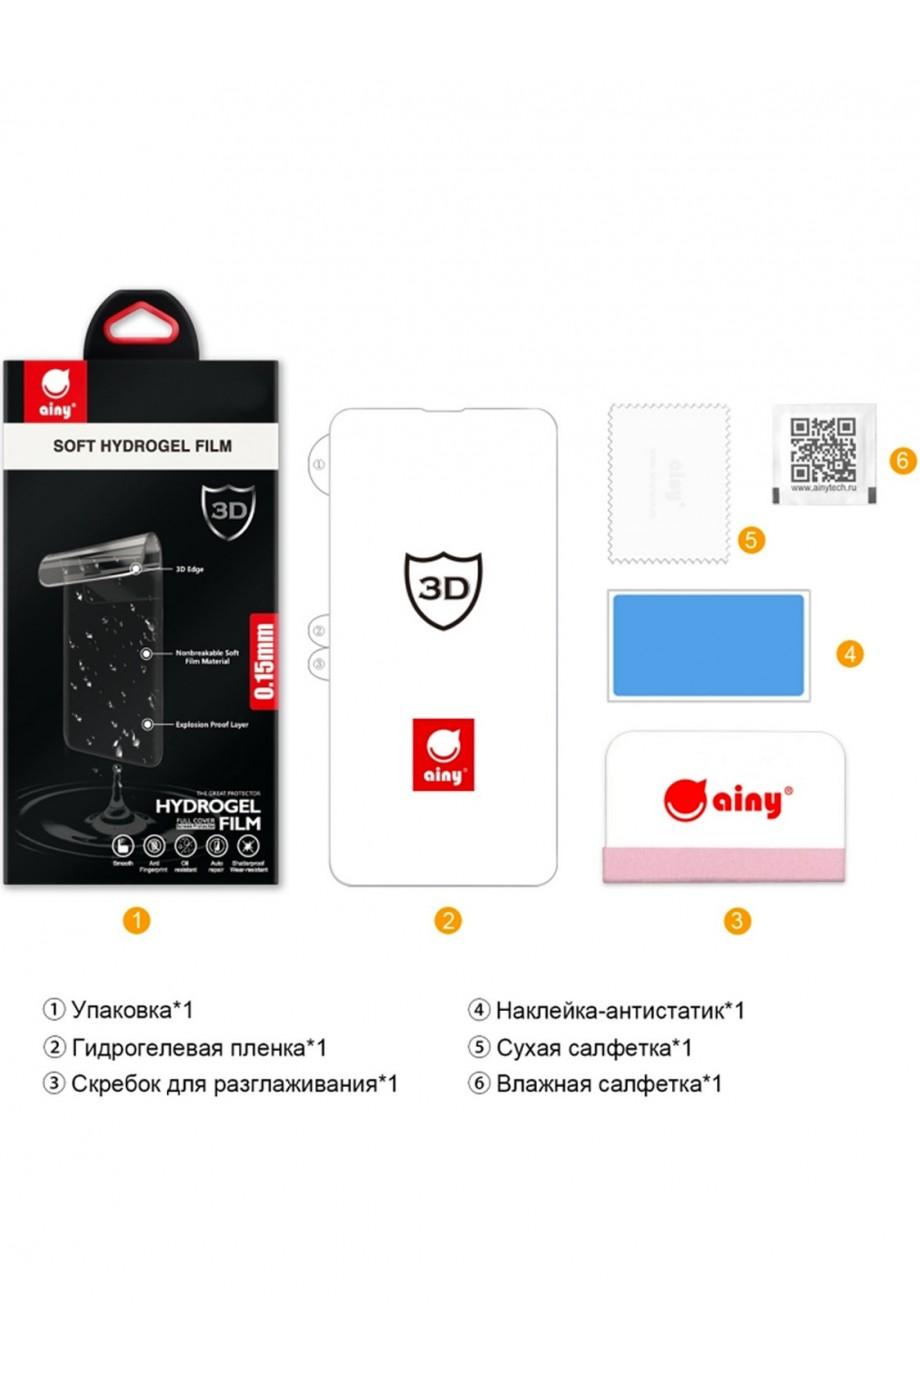 Гидрогелевая пленка 3D Ainy для Apple Watch 1/2/3 42 мм, 2 шт